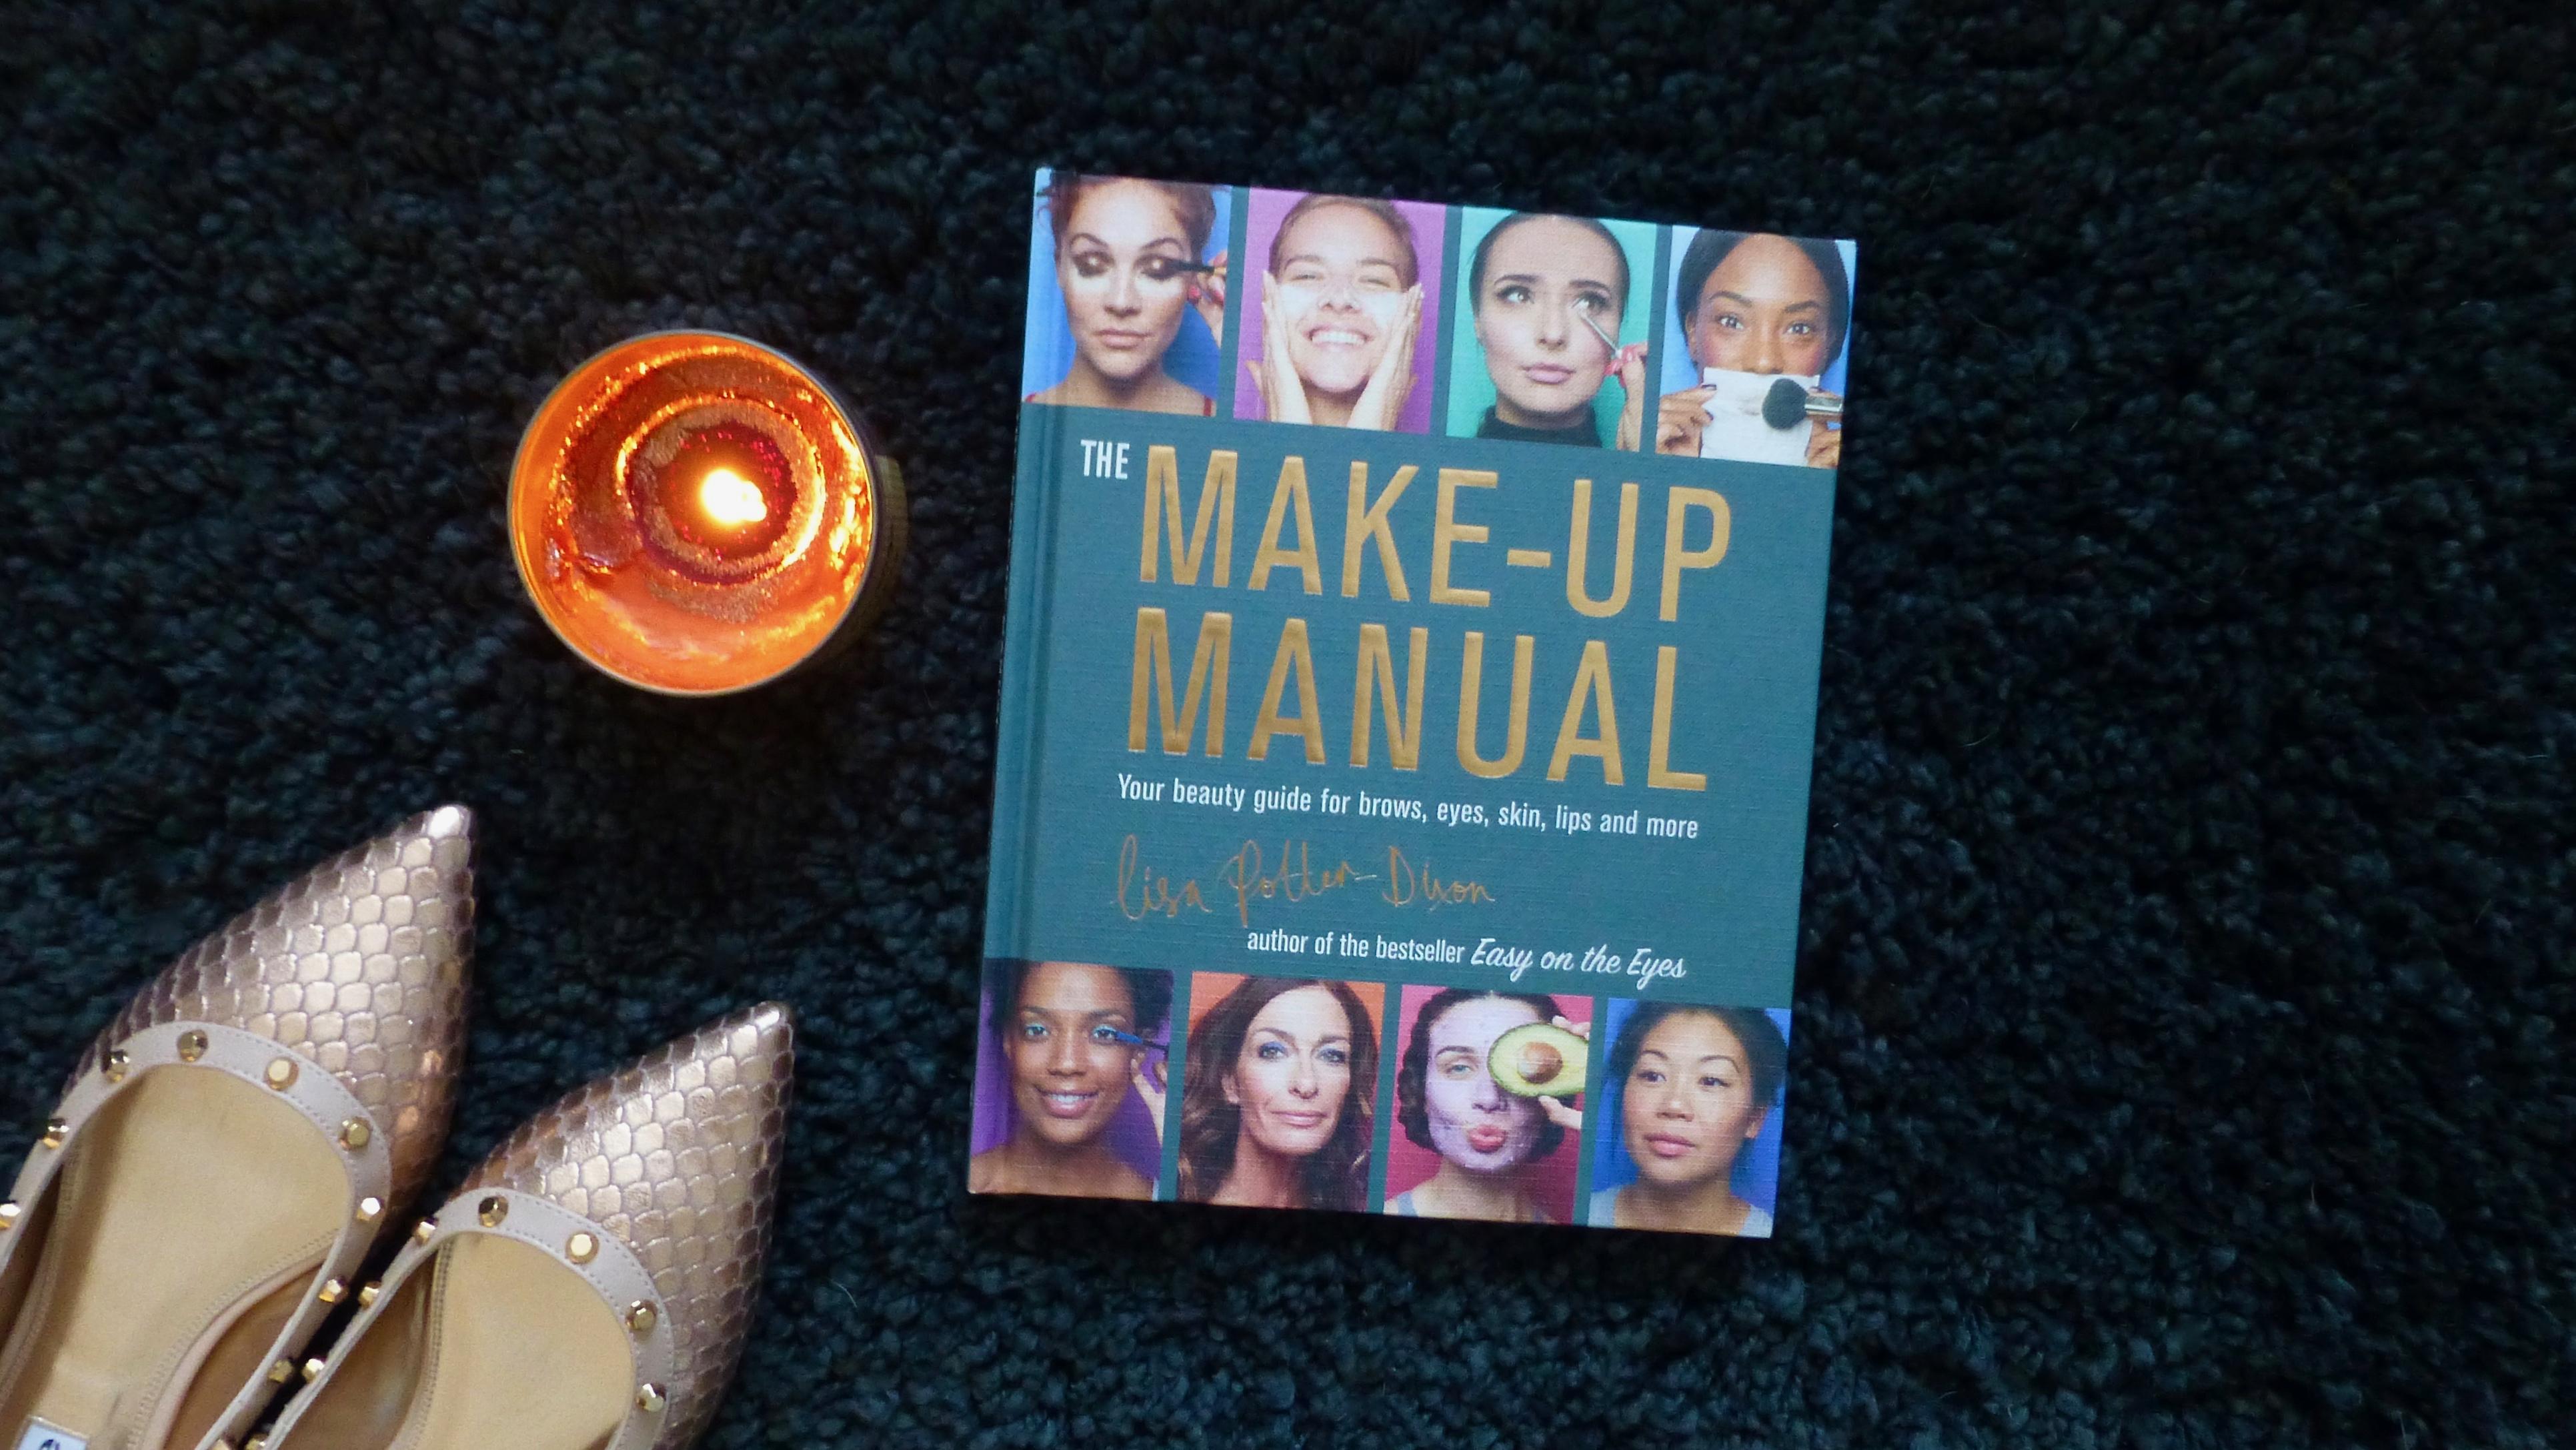 The Make Up Manual By Lisa Potter Dixon